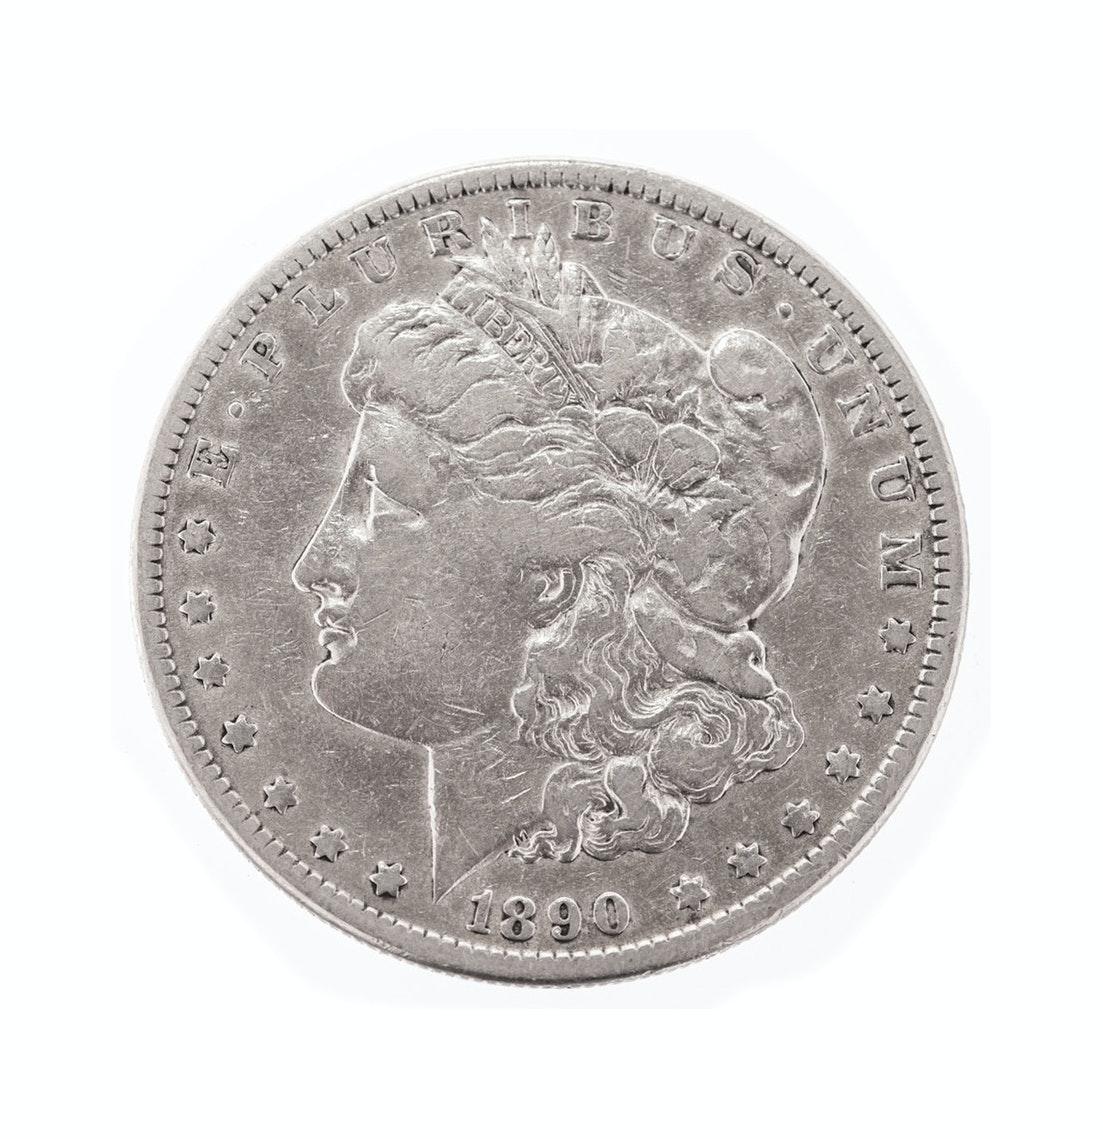 Coins, Housewares, Electronics & More